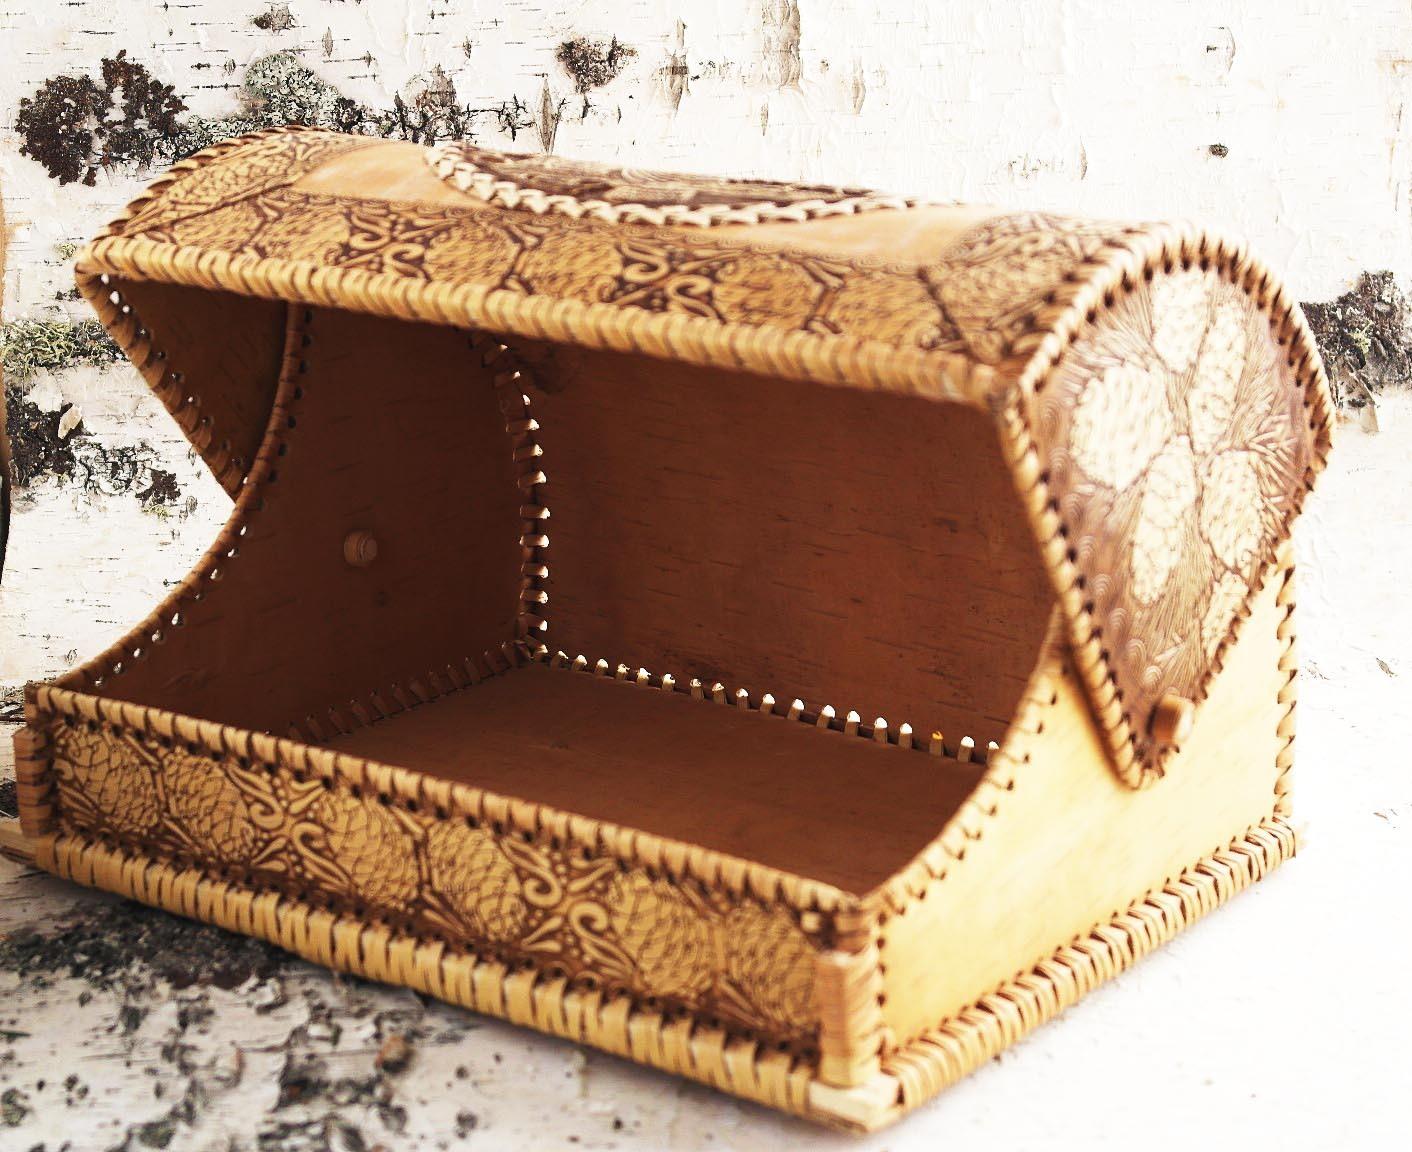 Открытая хлебница на бересте